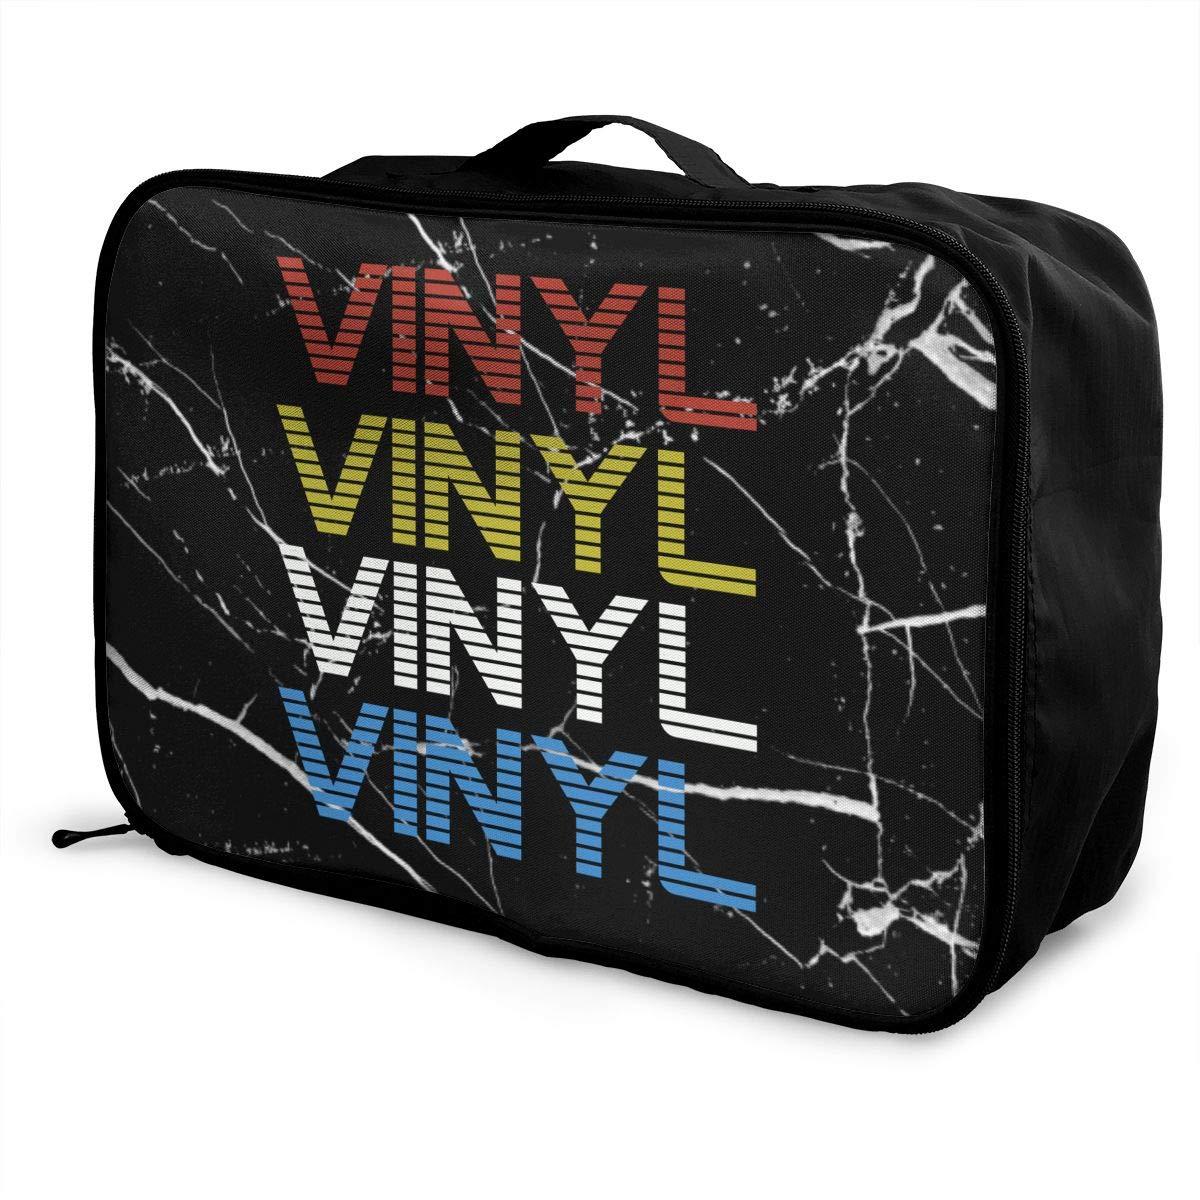 Retro Distressed Vinyl Record Luggage Bag Capacity Portable Large Travel Duffel Bag Makeup Storage